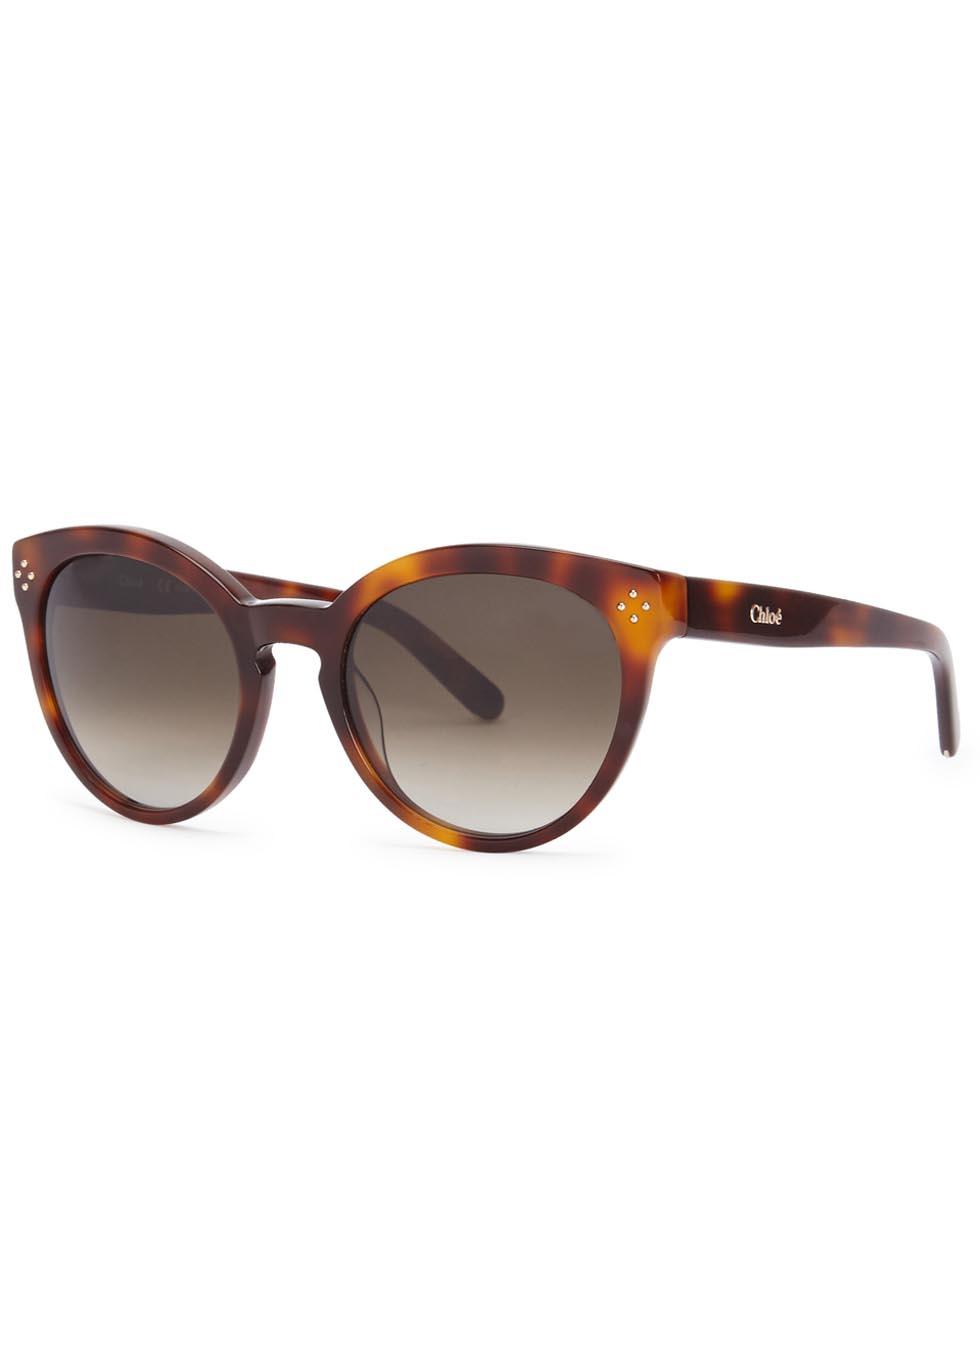 ea301b099b83 Chloe Carlina Sunglasses Ebay